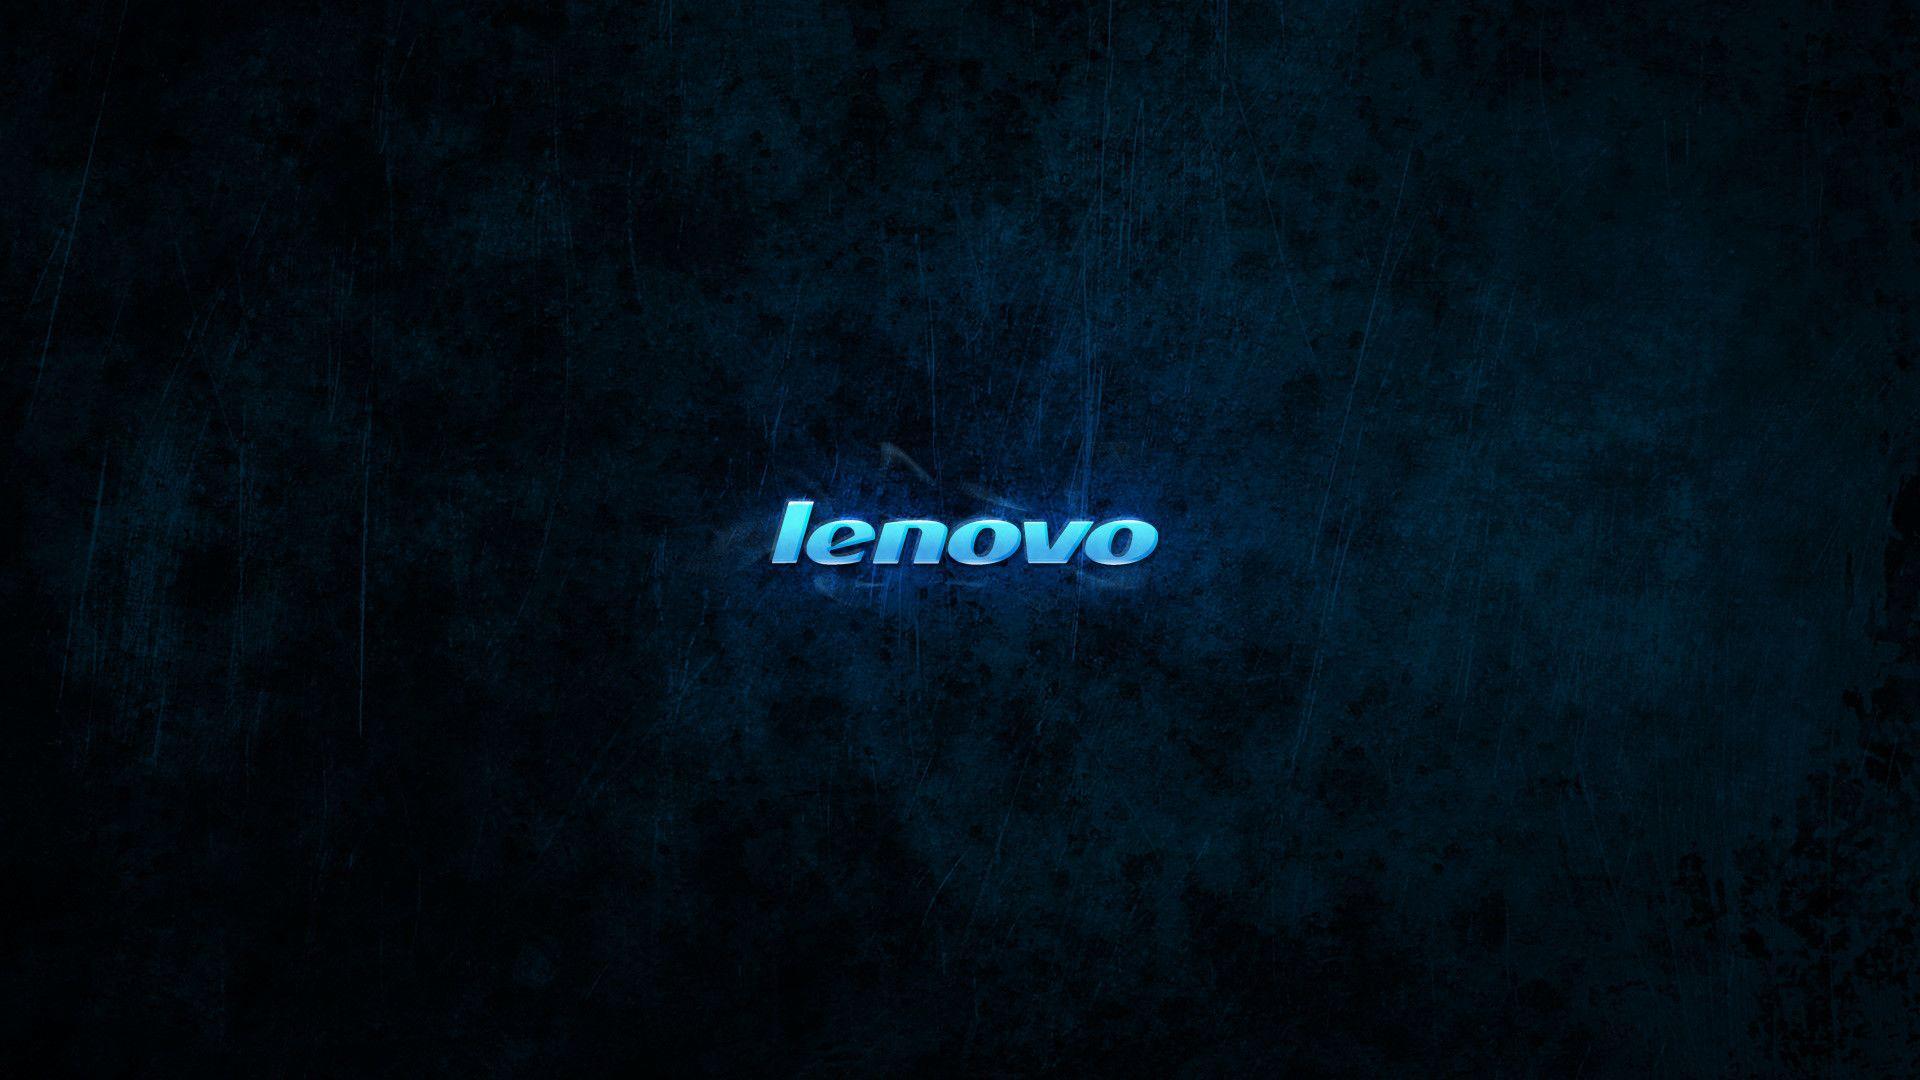 Lenovo 4k Wallpapers Top Free Lenovo 4k Backgrounds Wallpaperaccess